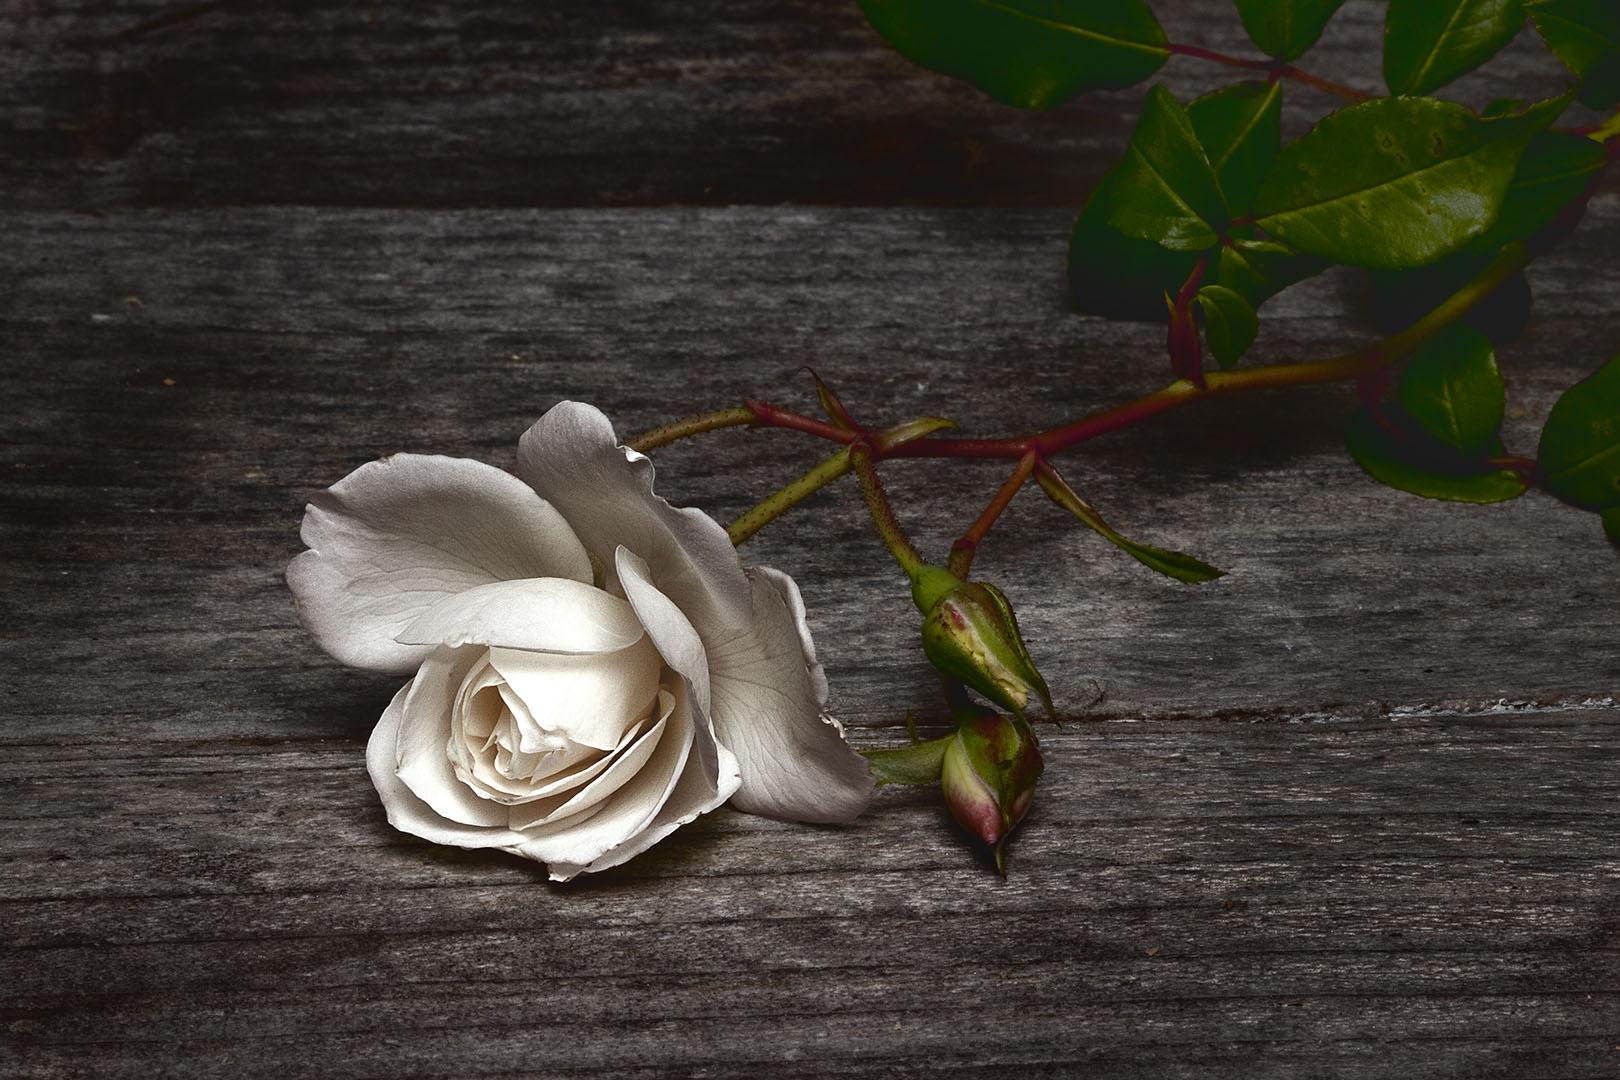 Pam's Rose